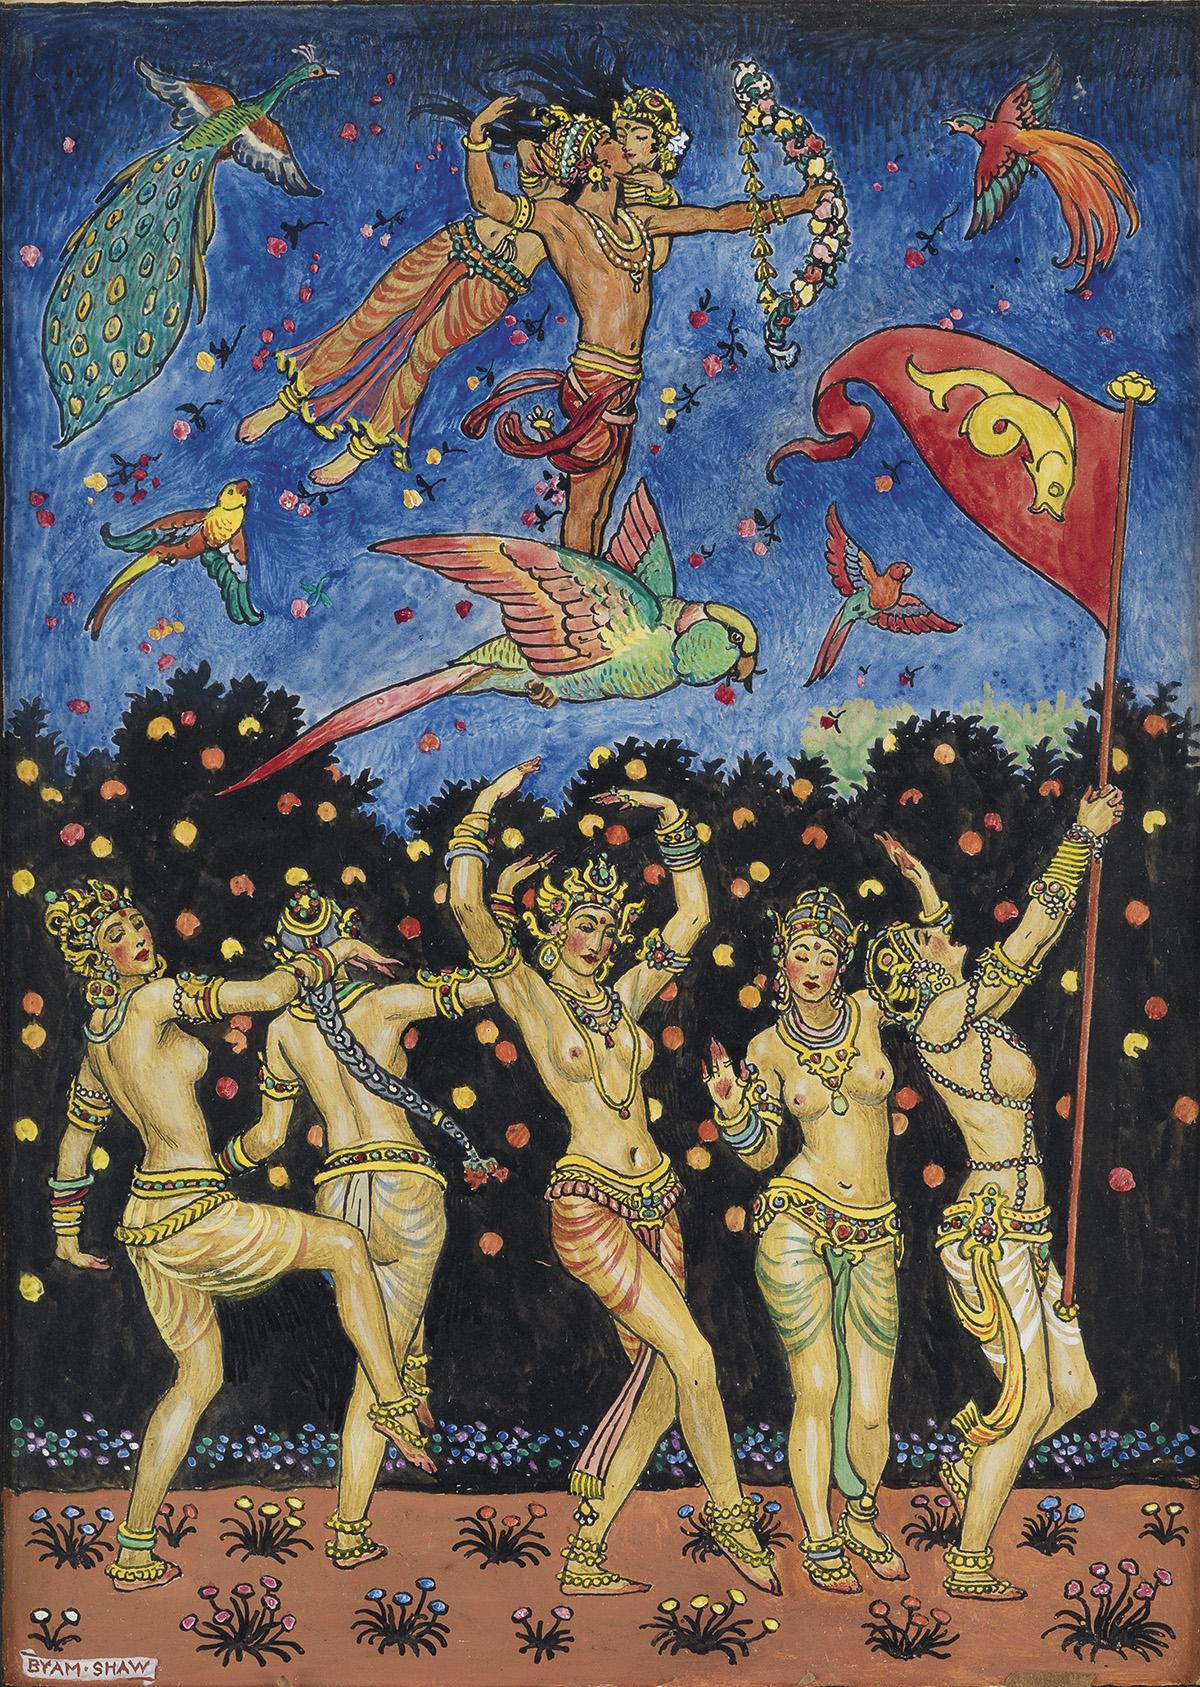 JOHN BYAM SHAW. The Garden of Kama, and other love lyrics from India.